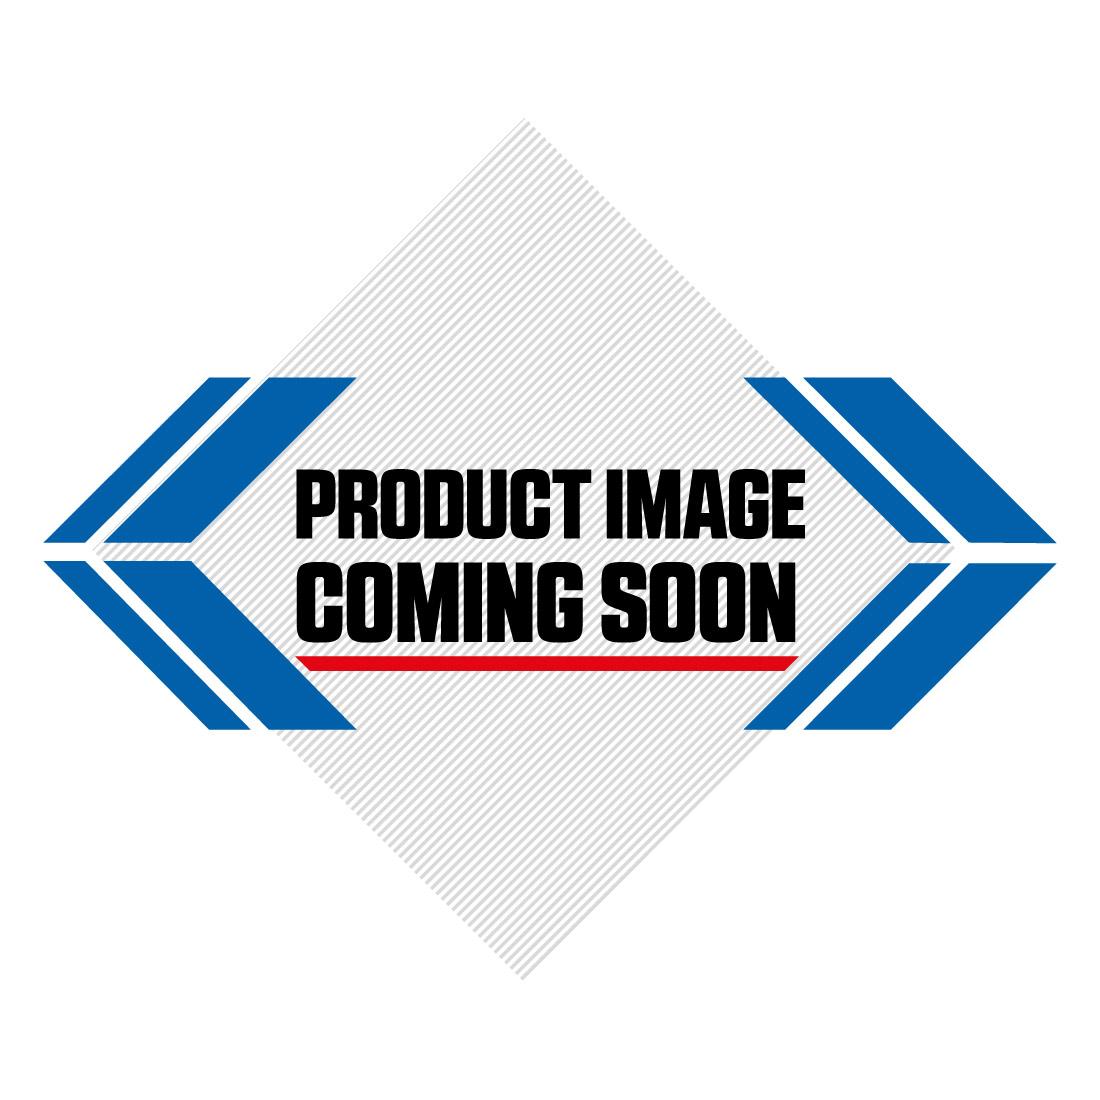 DJI Mavic 2 Pro Drone Image-6>